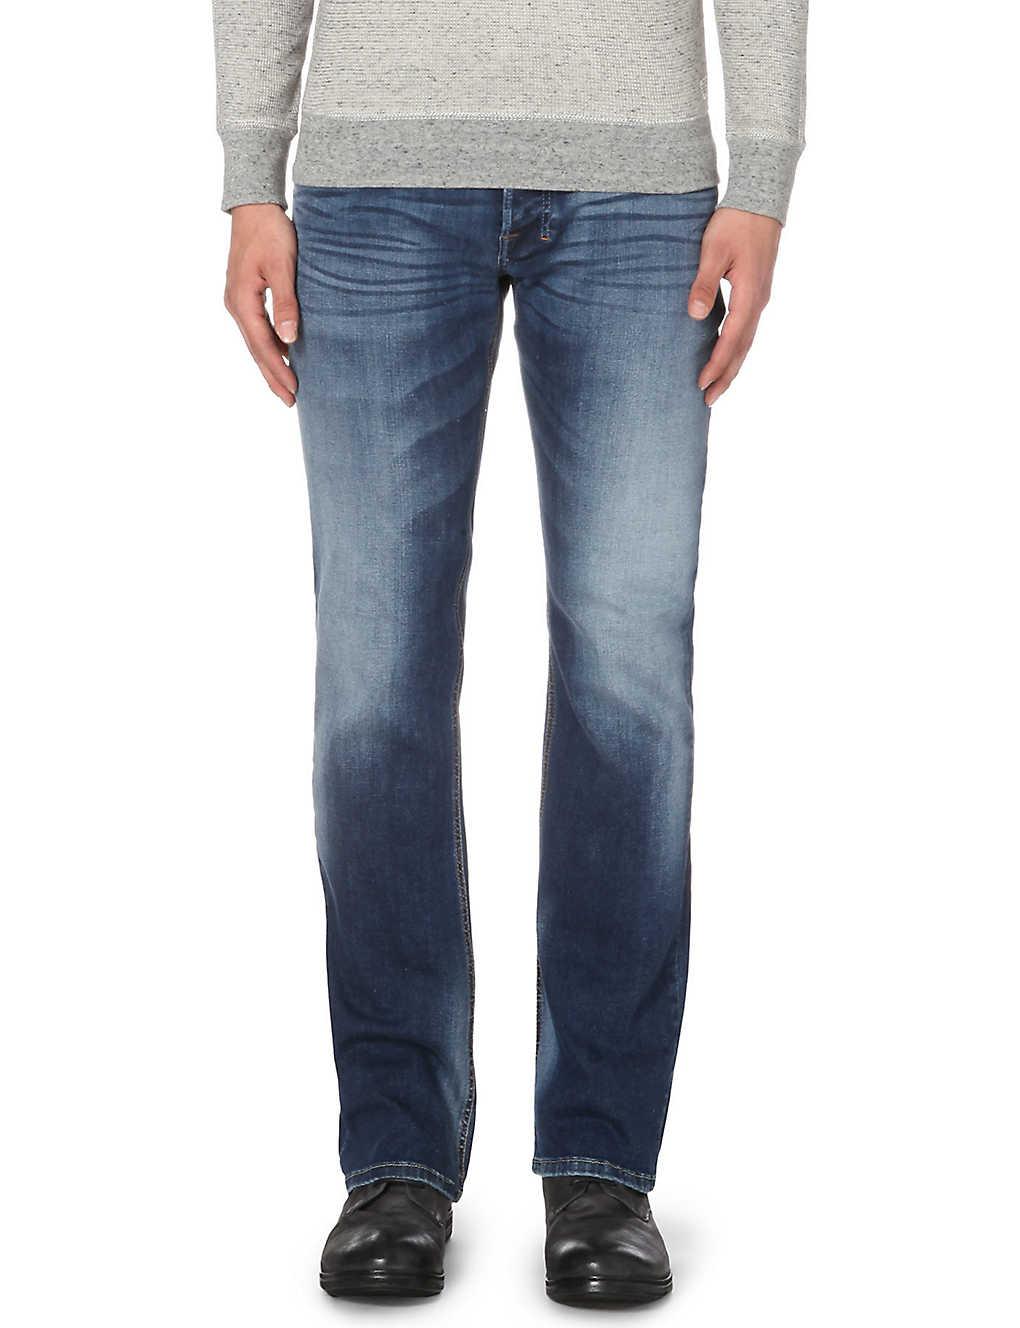 b272d8154c5 DIESEL - Zatiny 0839h regular-fit bootcut jeans l32 | Selfridges.com